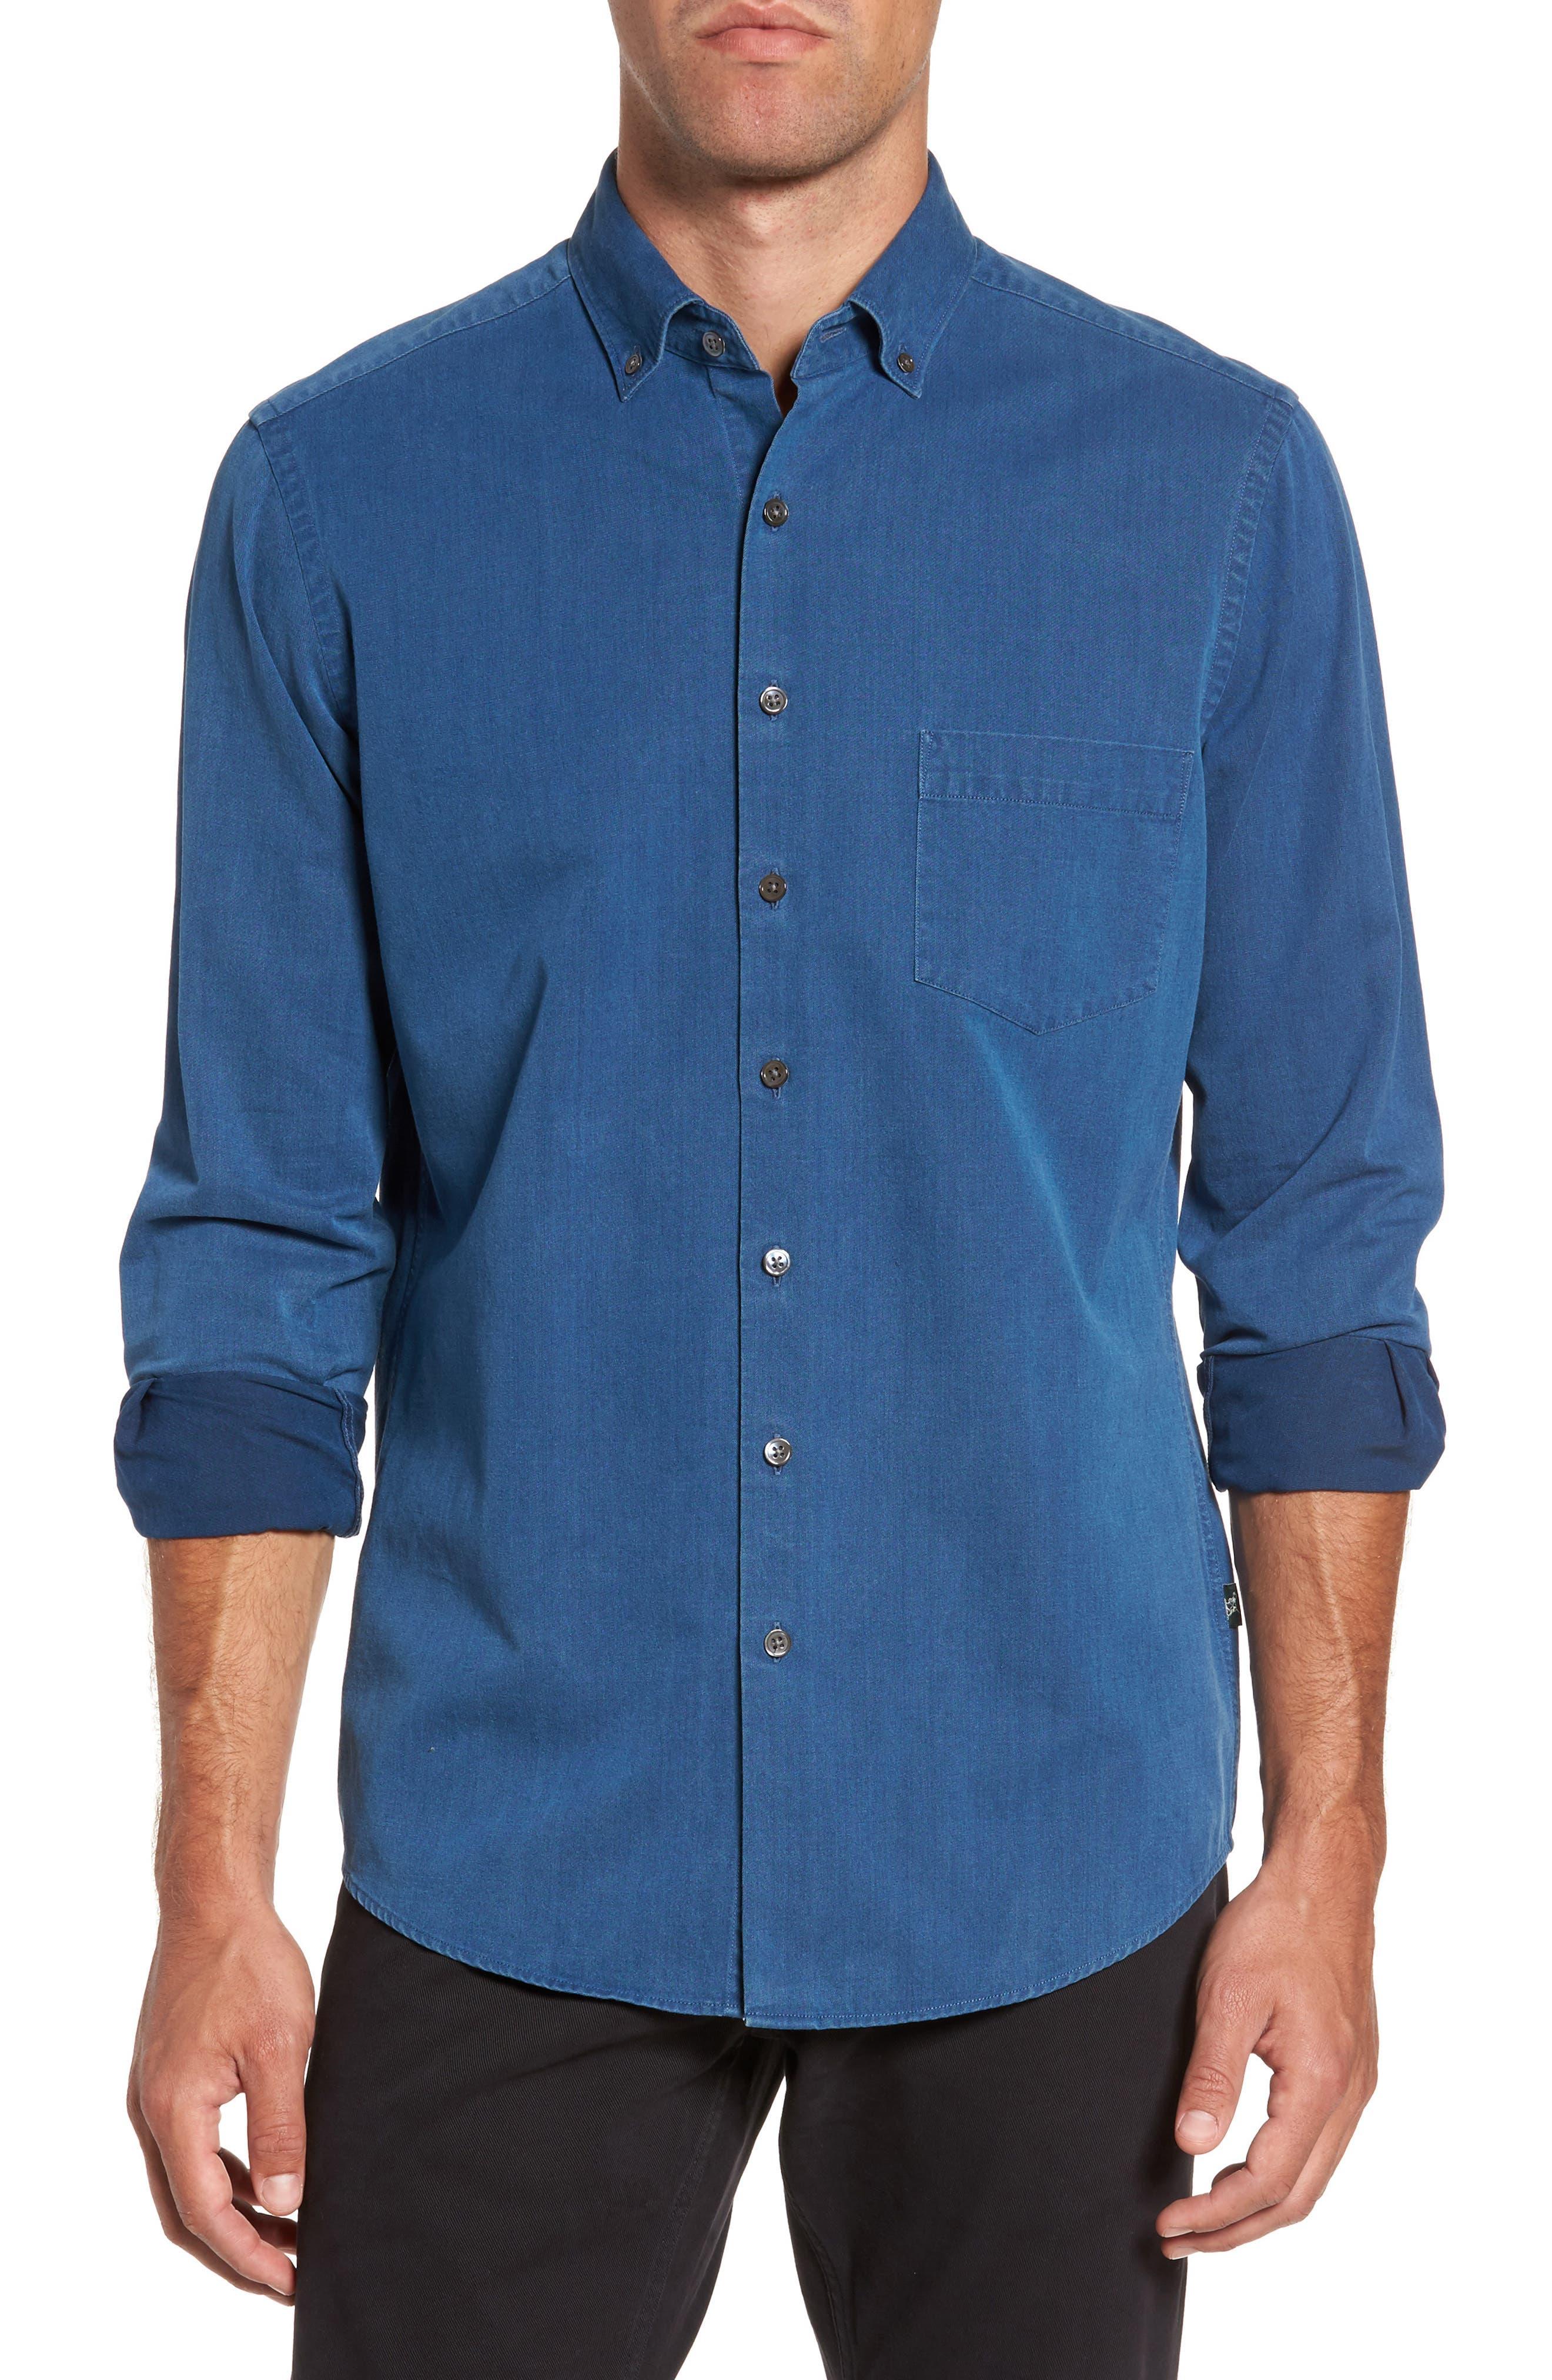 Rodd & Gunn Bayswater Sports Fit Sport Shirt